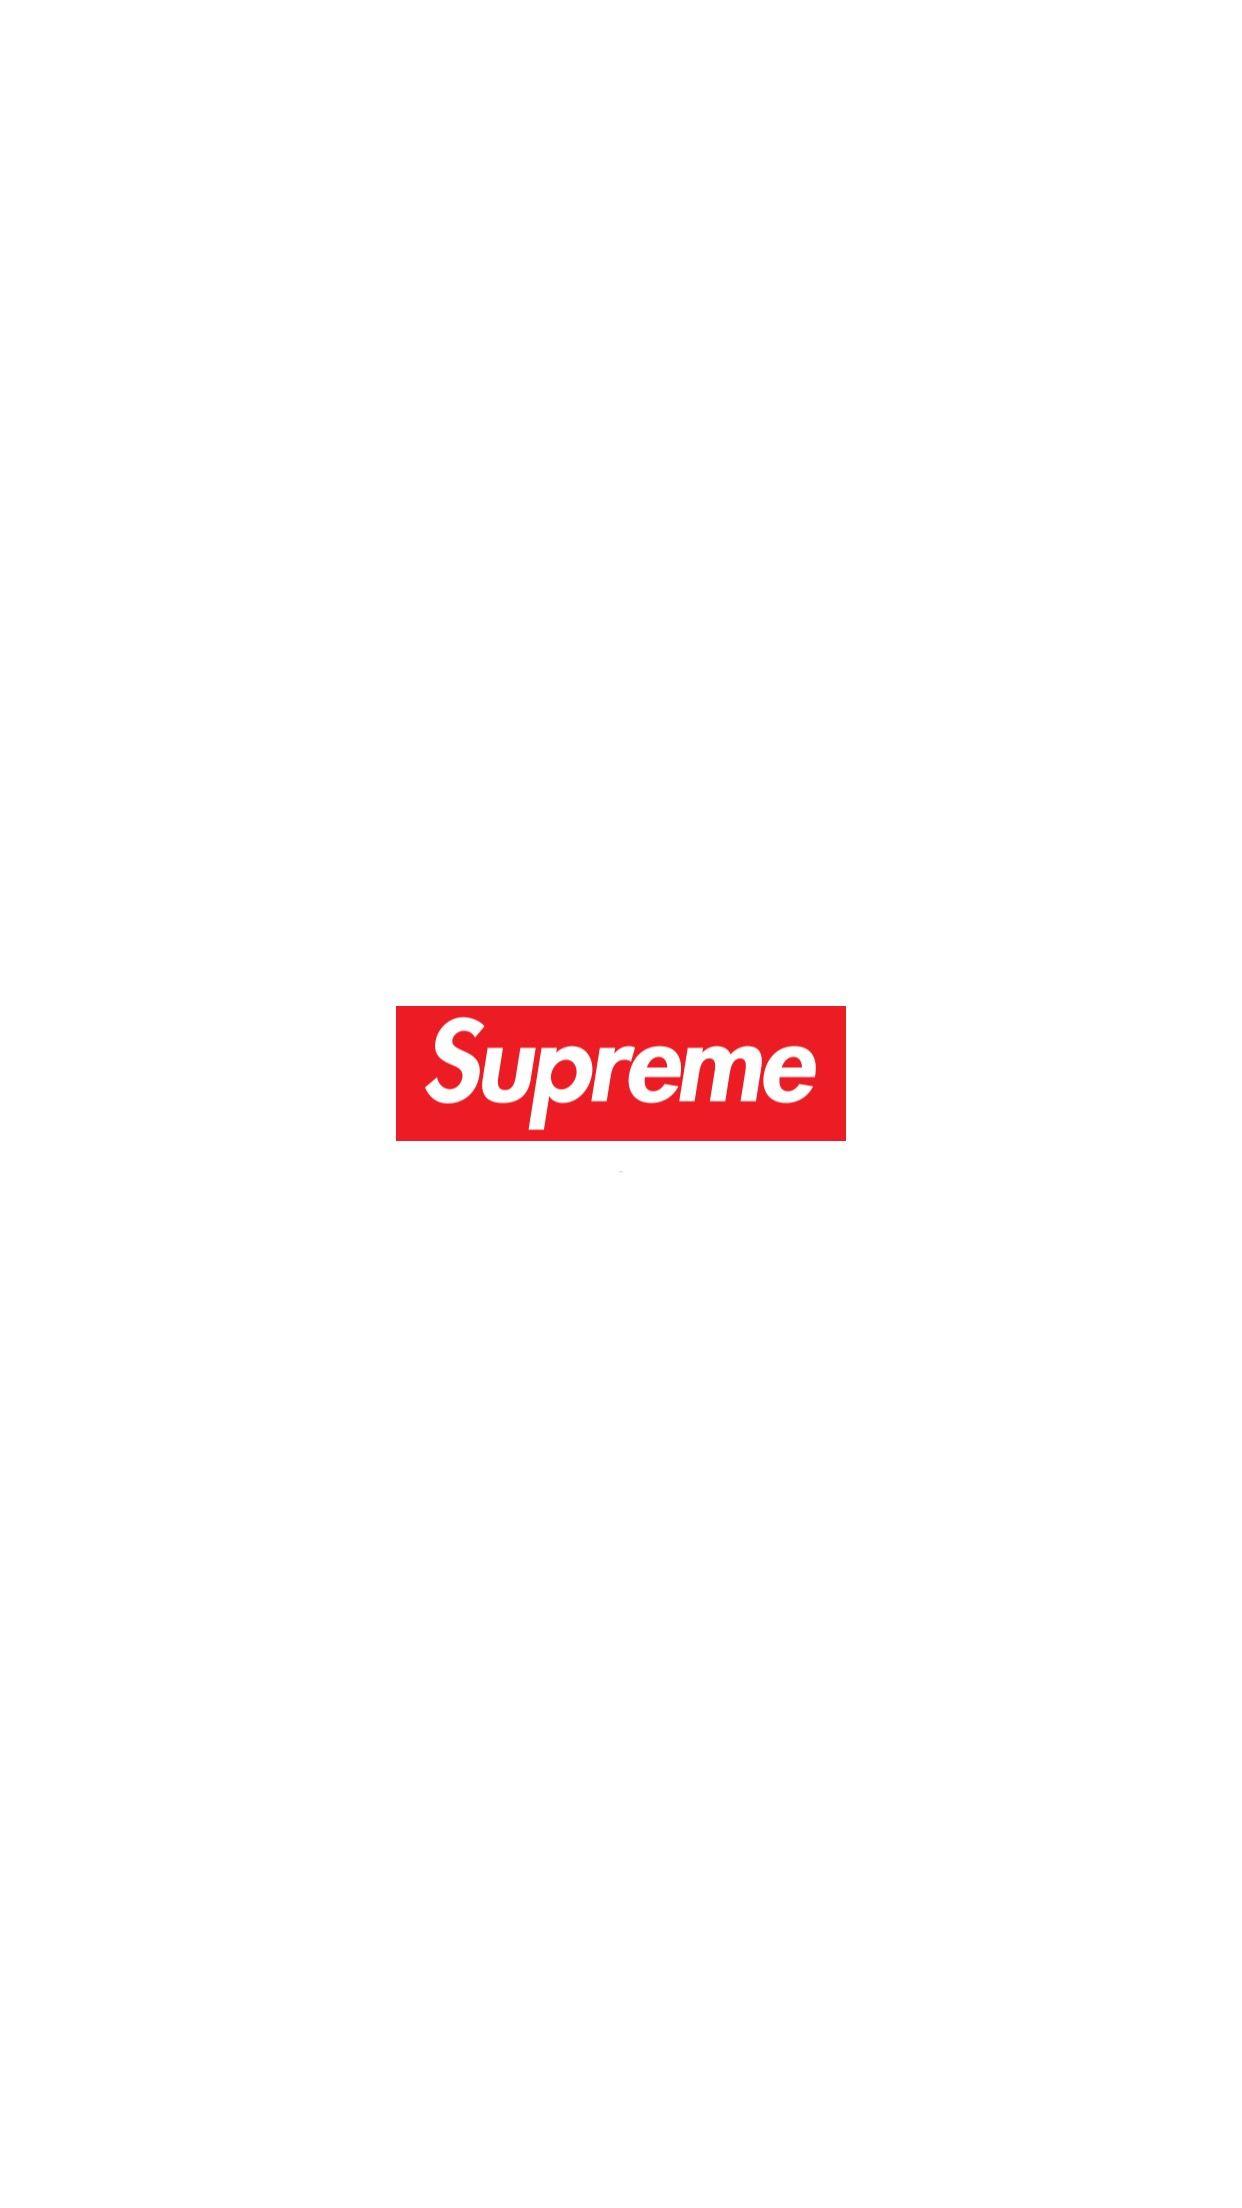 supreme supreme wallpaper preme preme wallpaper